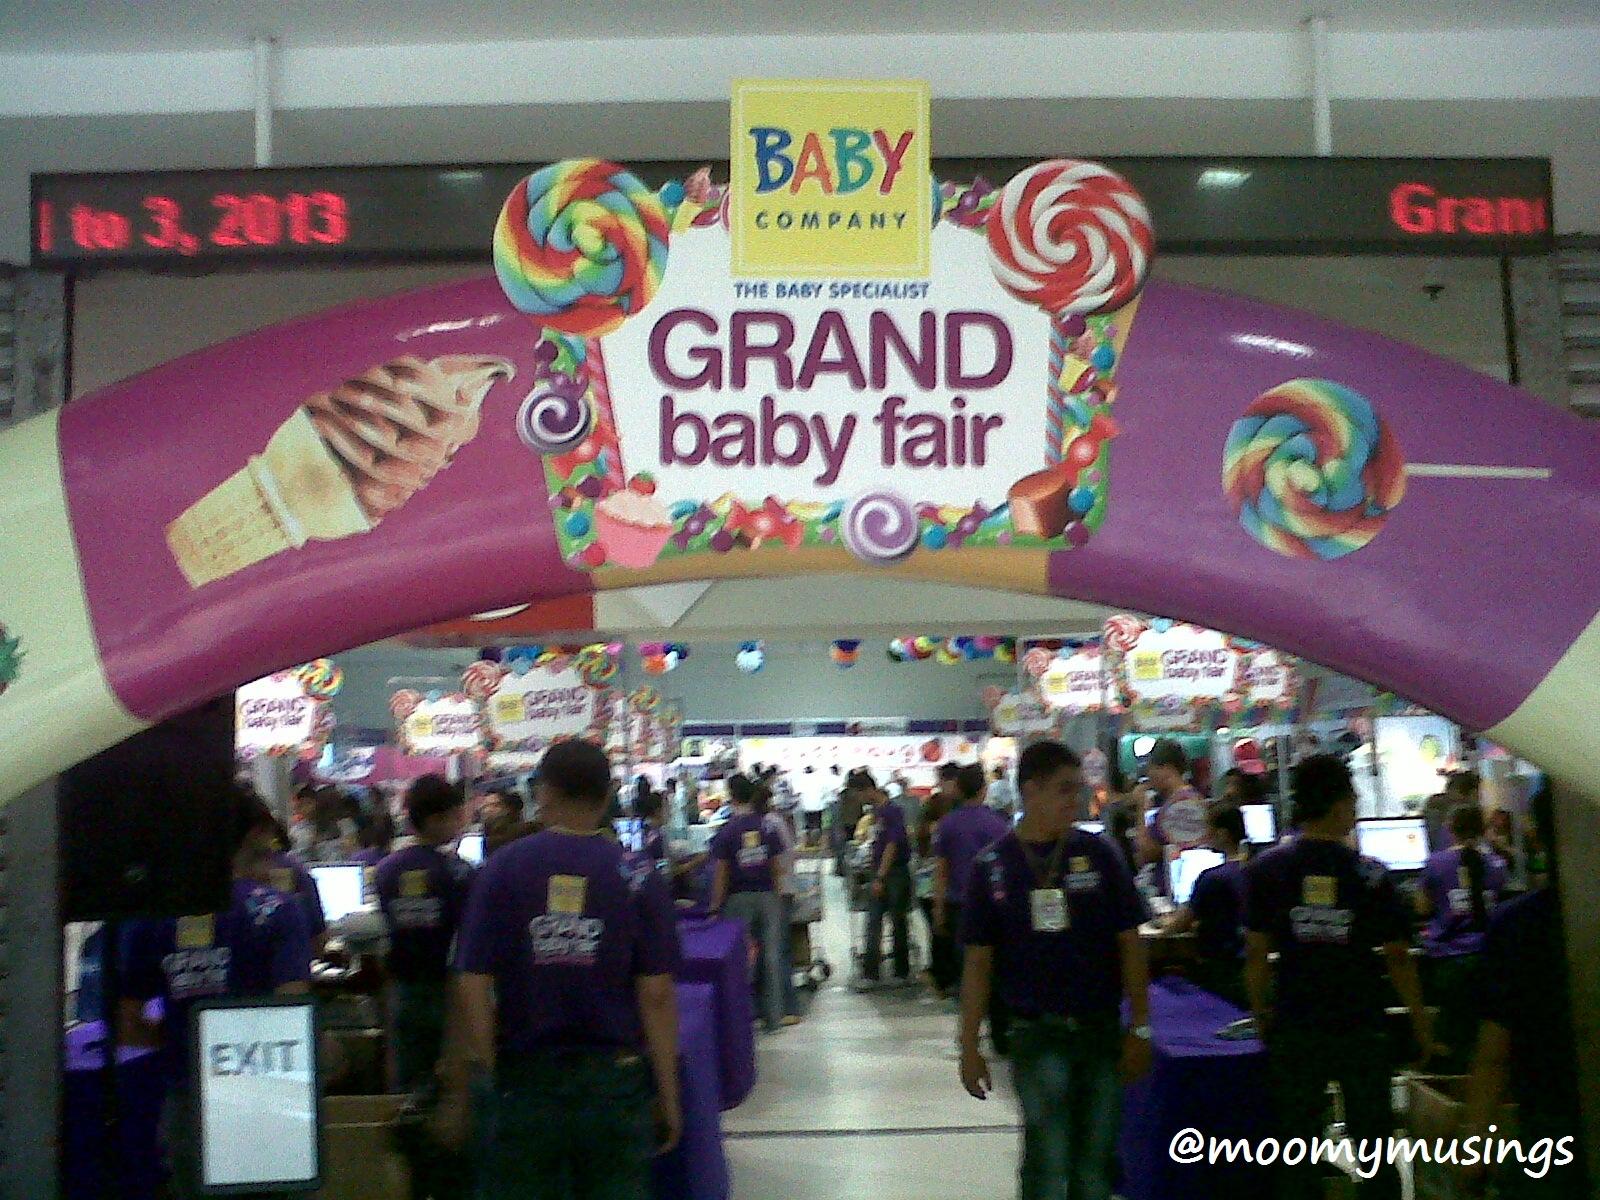 Baby Company S Grand Baby Fair 3 Moomy Musings